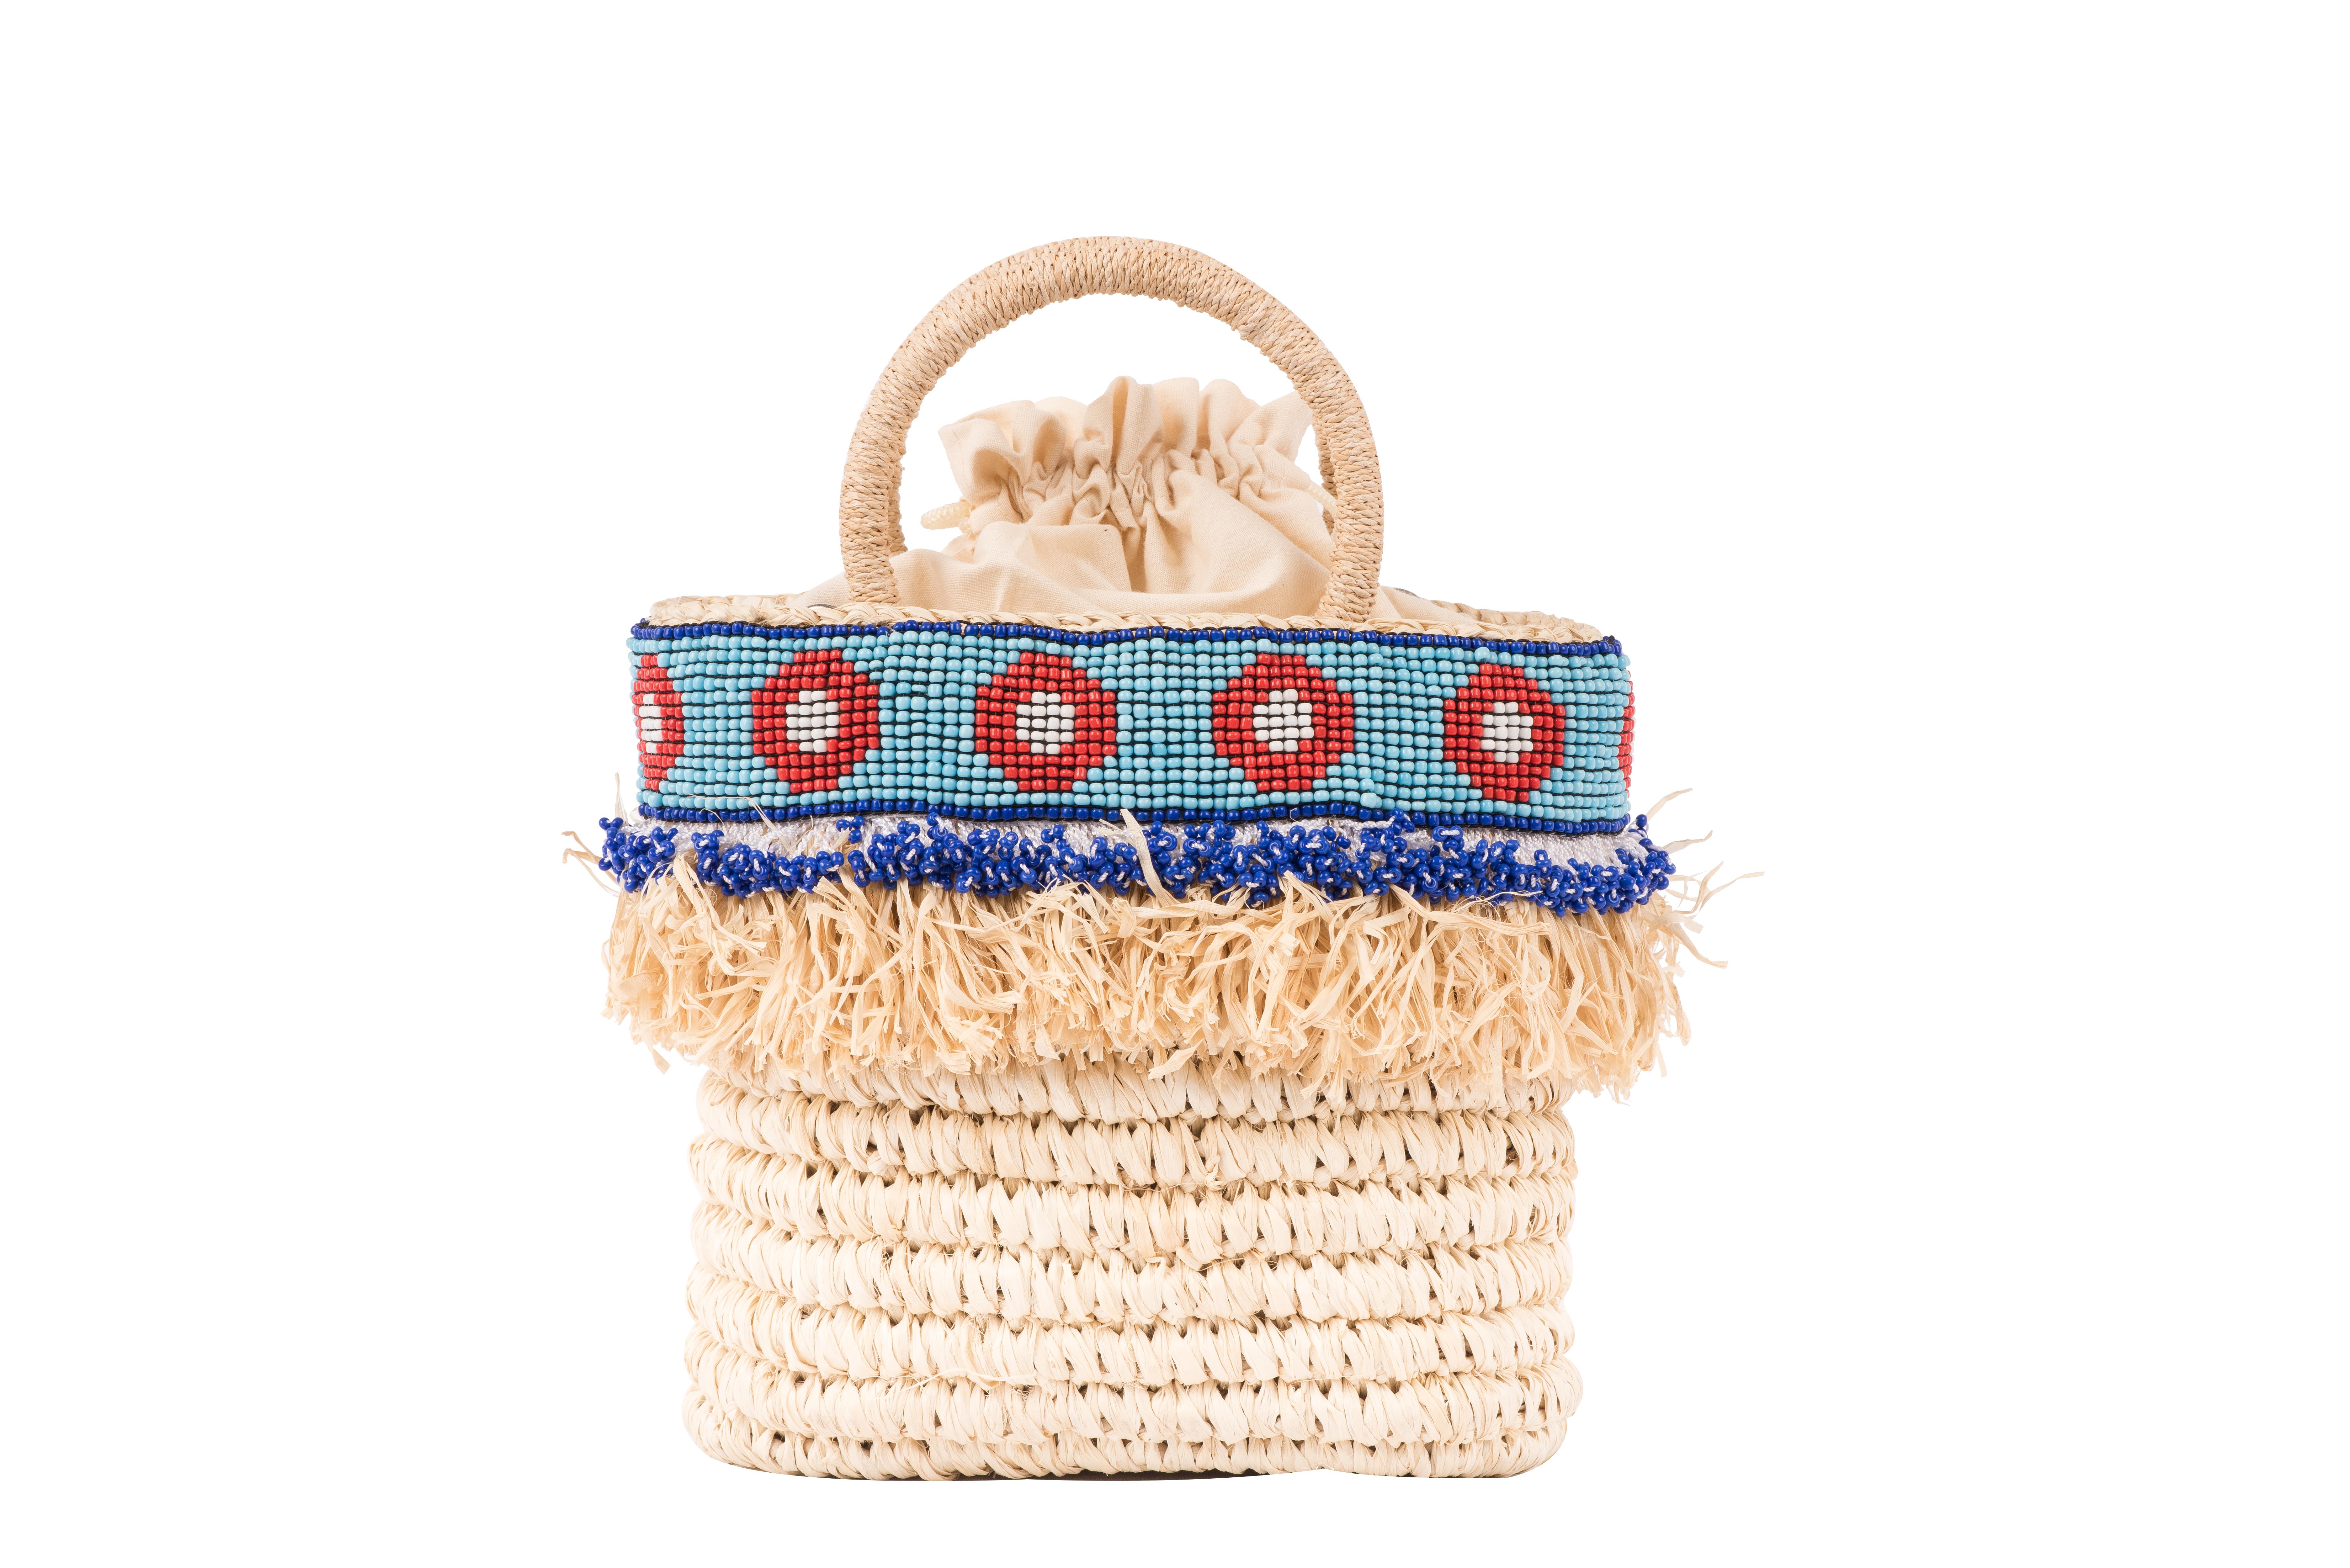 Tahiti Bag - Mini by Madebywave on curated-crowd.com